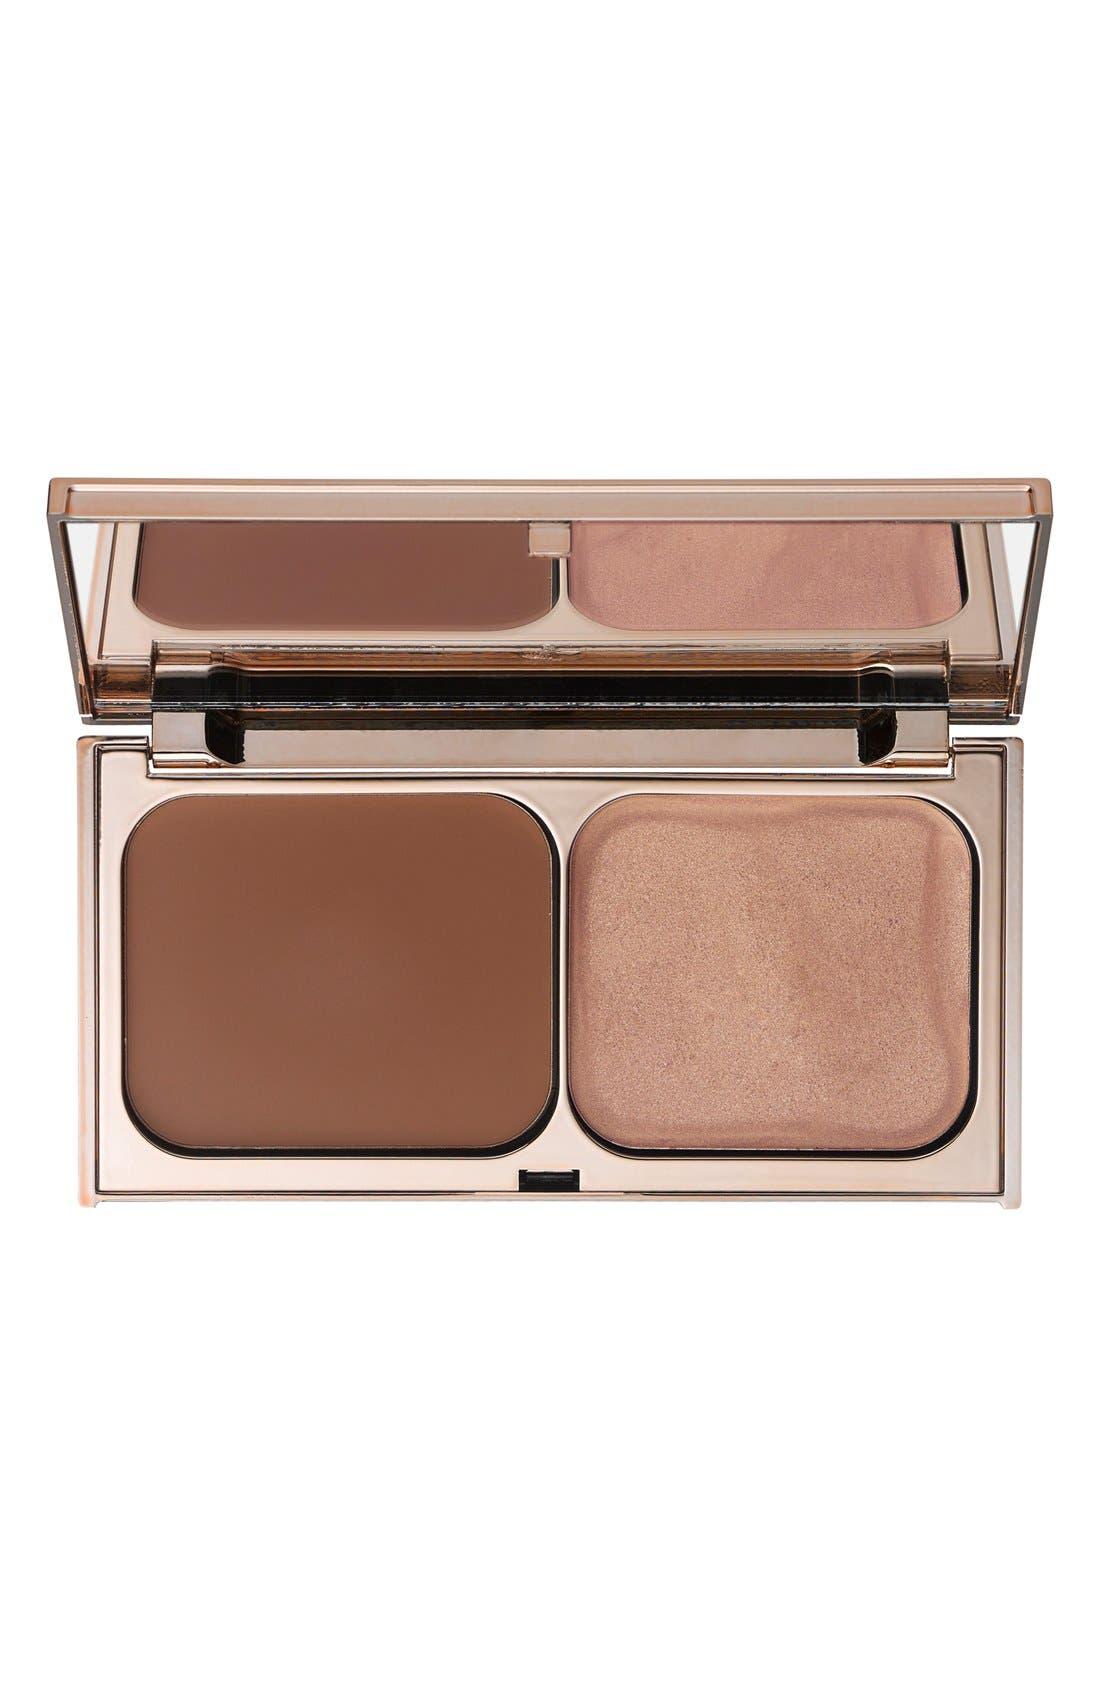 Norman Parkinson - Filmstar Bronze & Glow Sun Tan & Sun Light Face Sculpt & Highlight,                             Main thumbnail 1, color,                             000